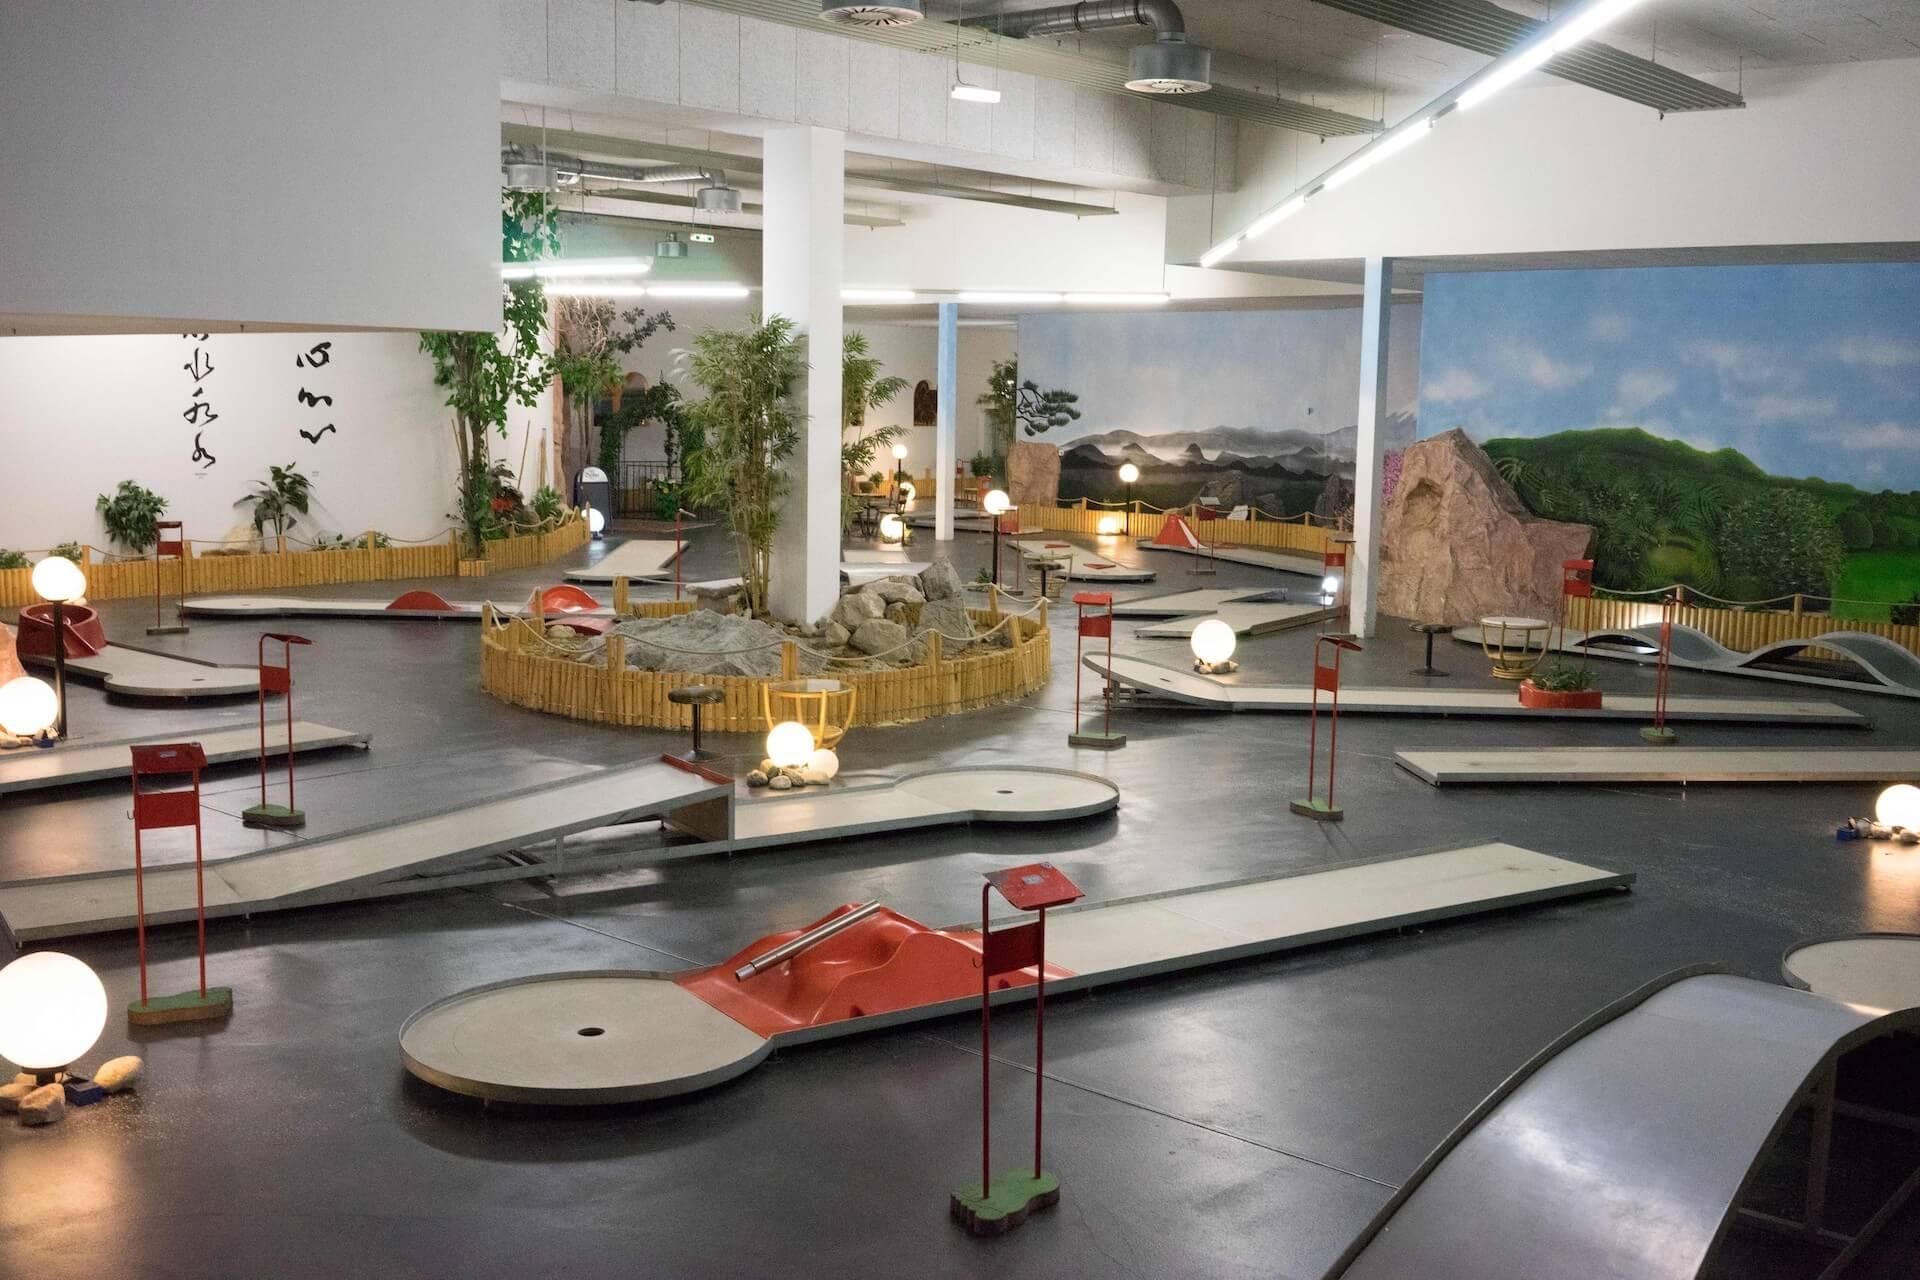 eugendorf-ausflugsziele-familie-bowling